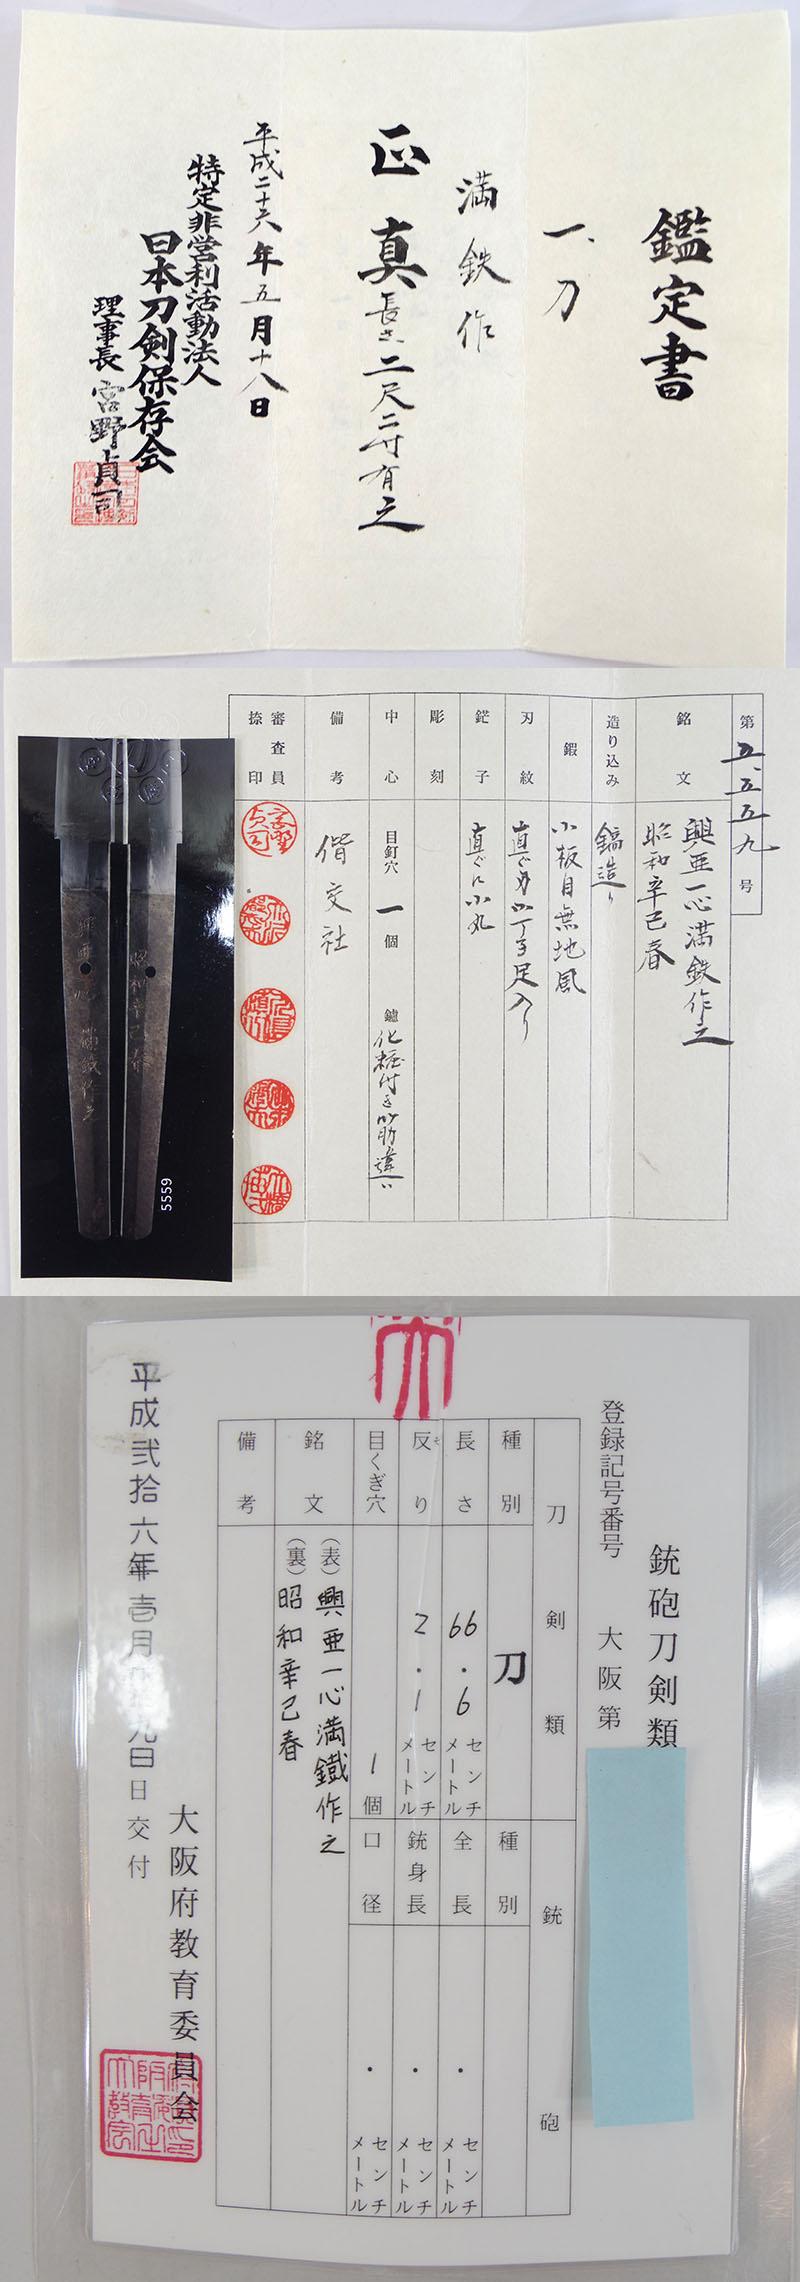 興亜一心満鐡作之(満鉄刀) Picture of Certificate